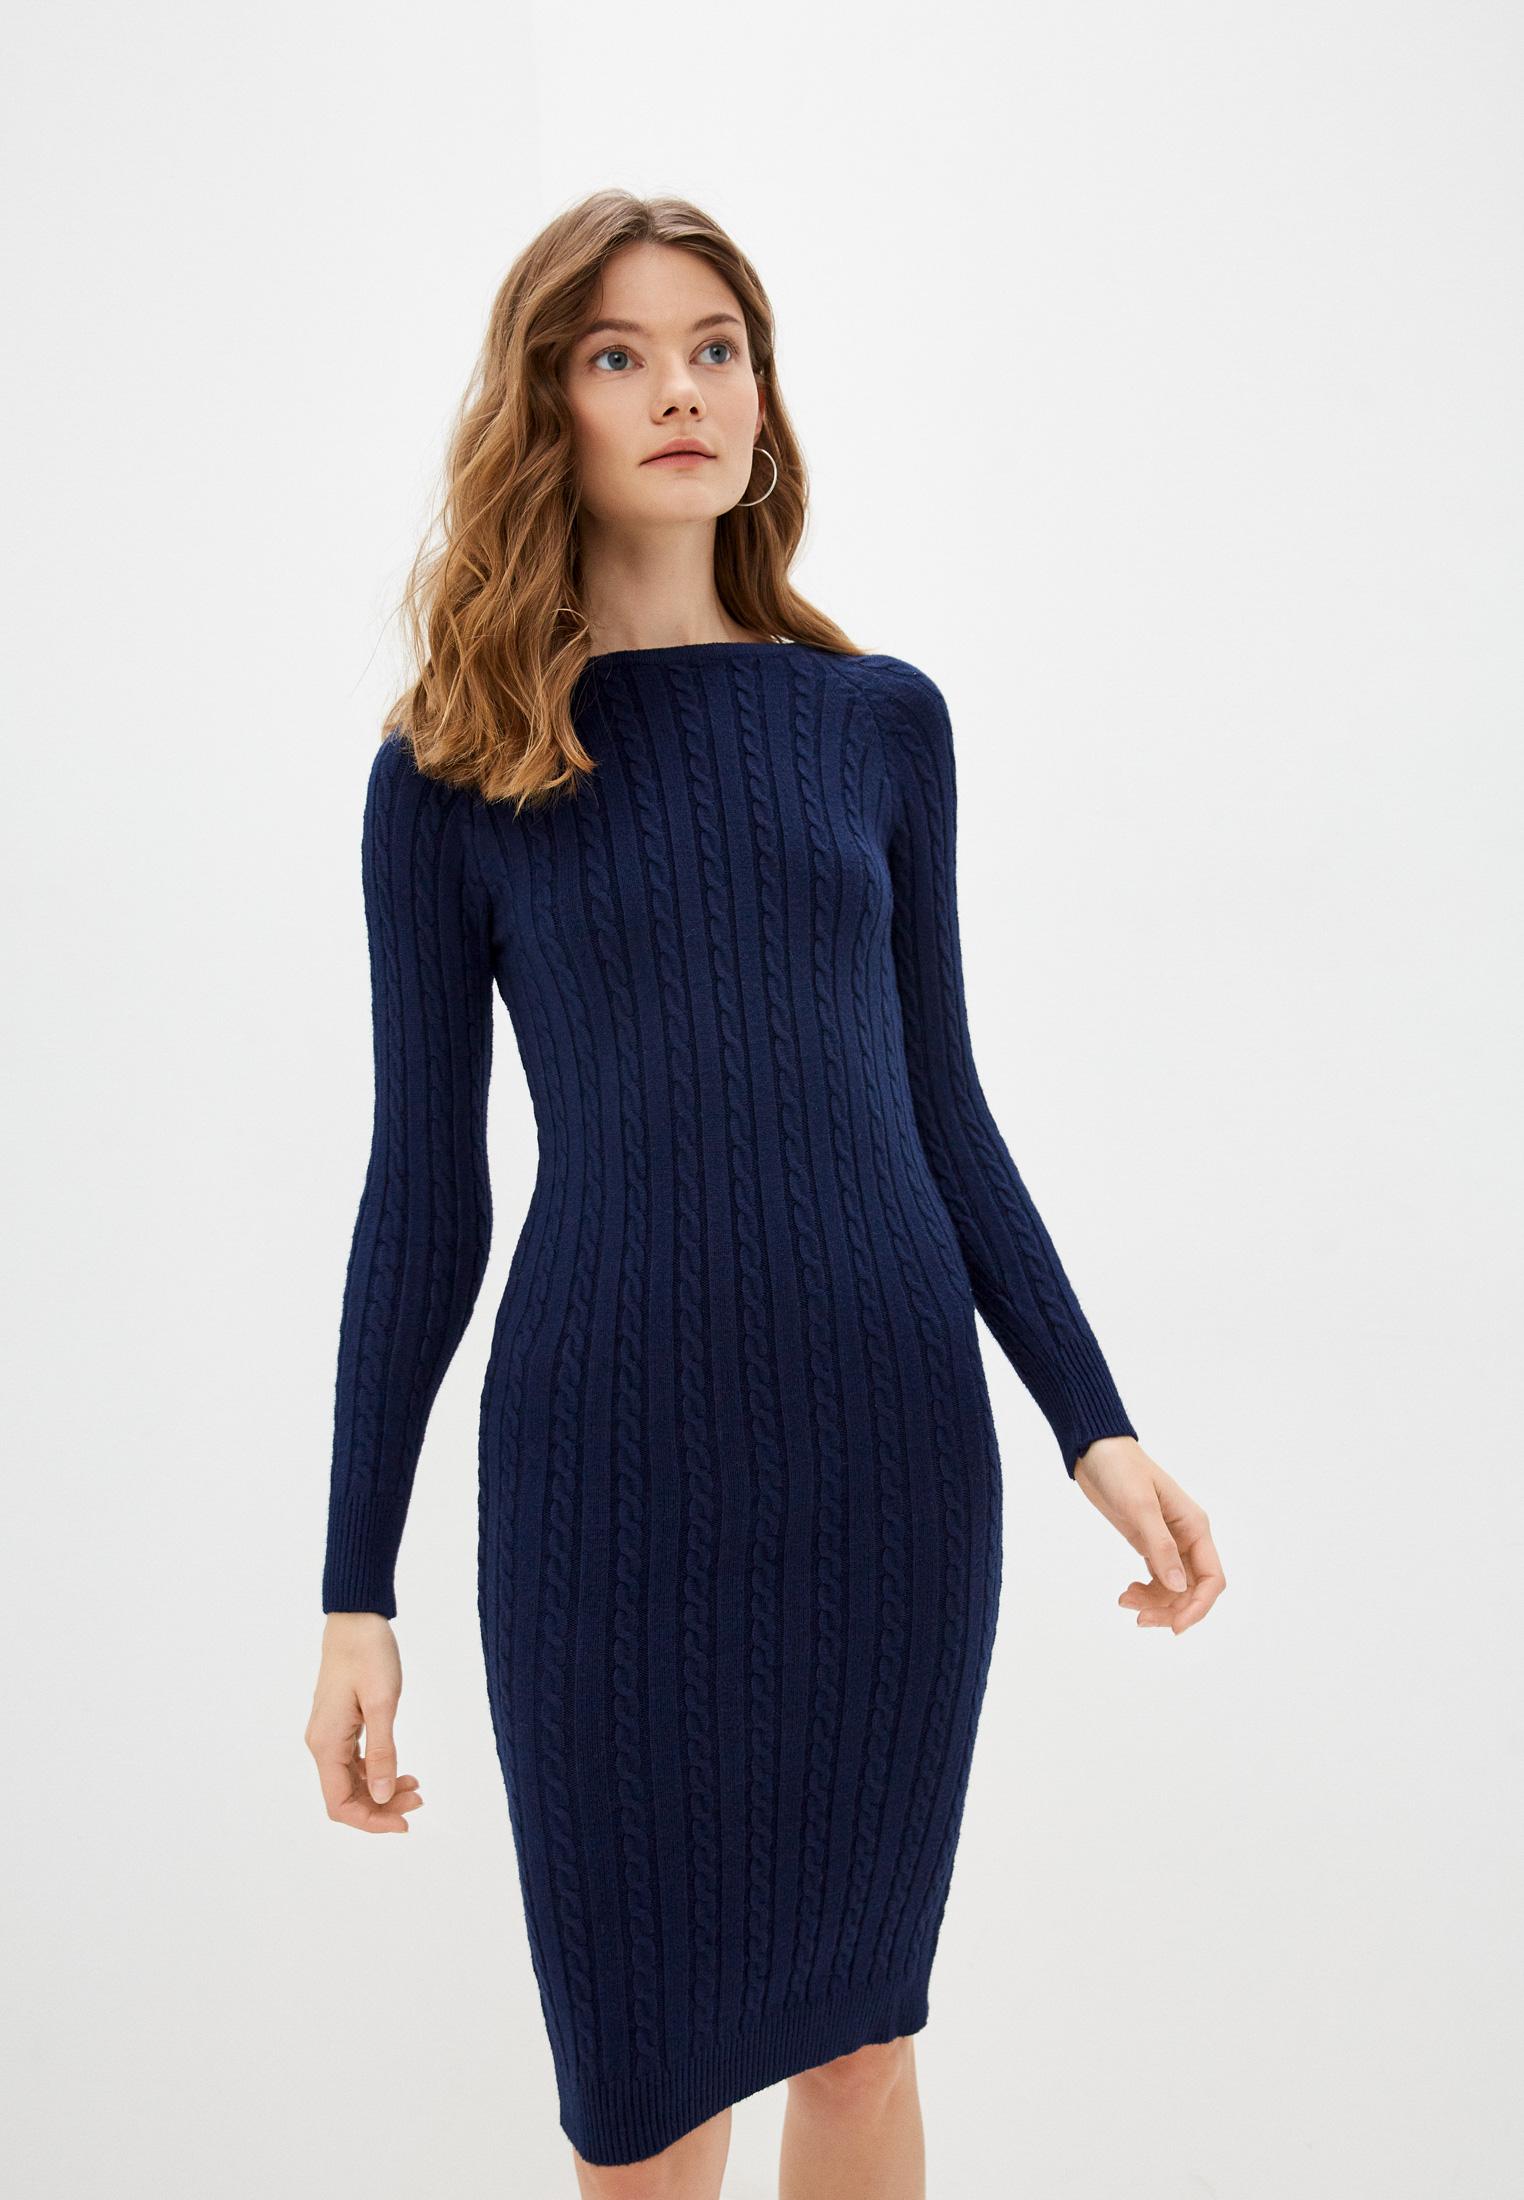 Вязаное платье Vickwool VW271-2